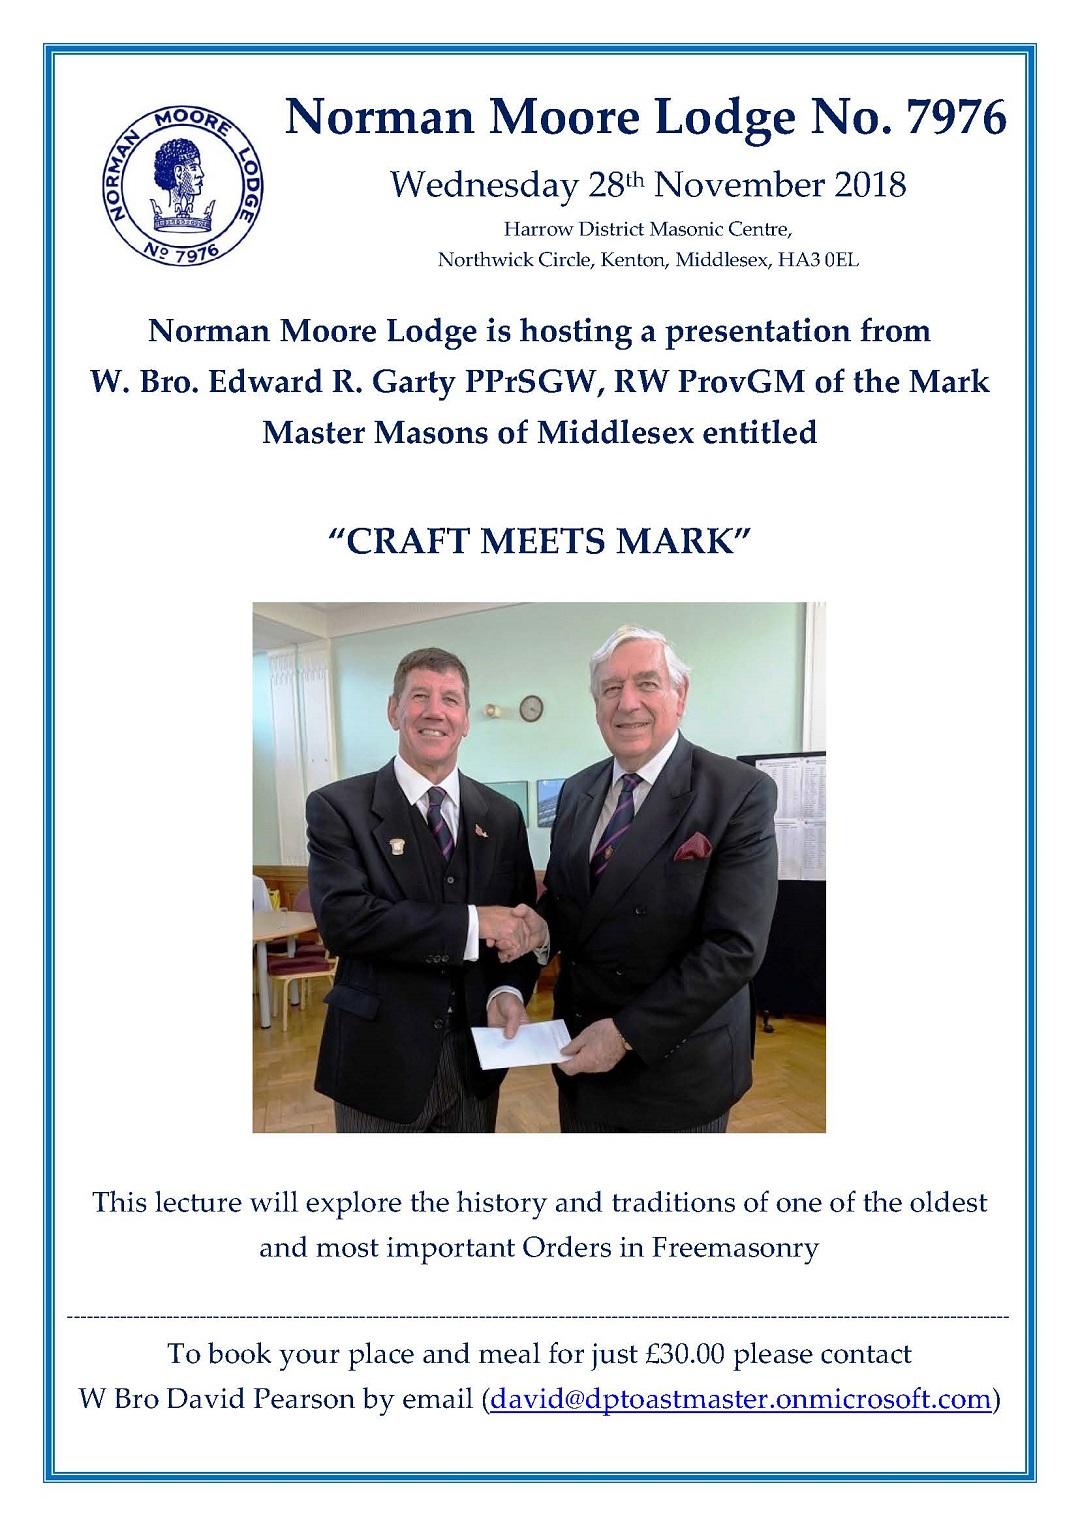 NML Lecture Flyer - Nov '18